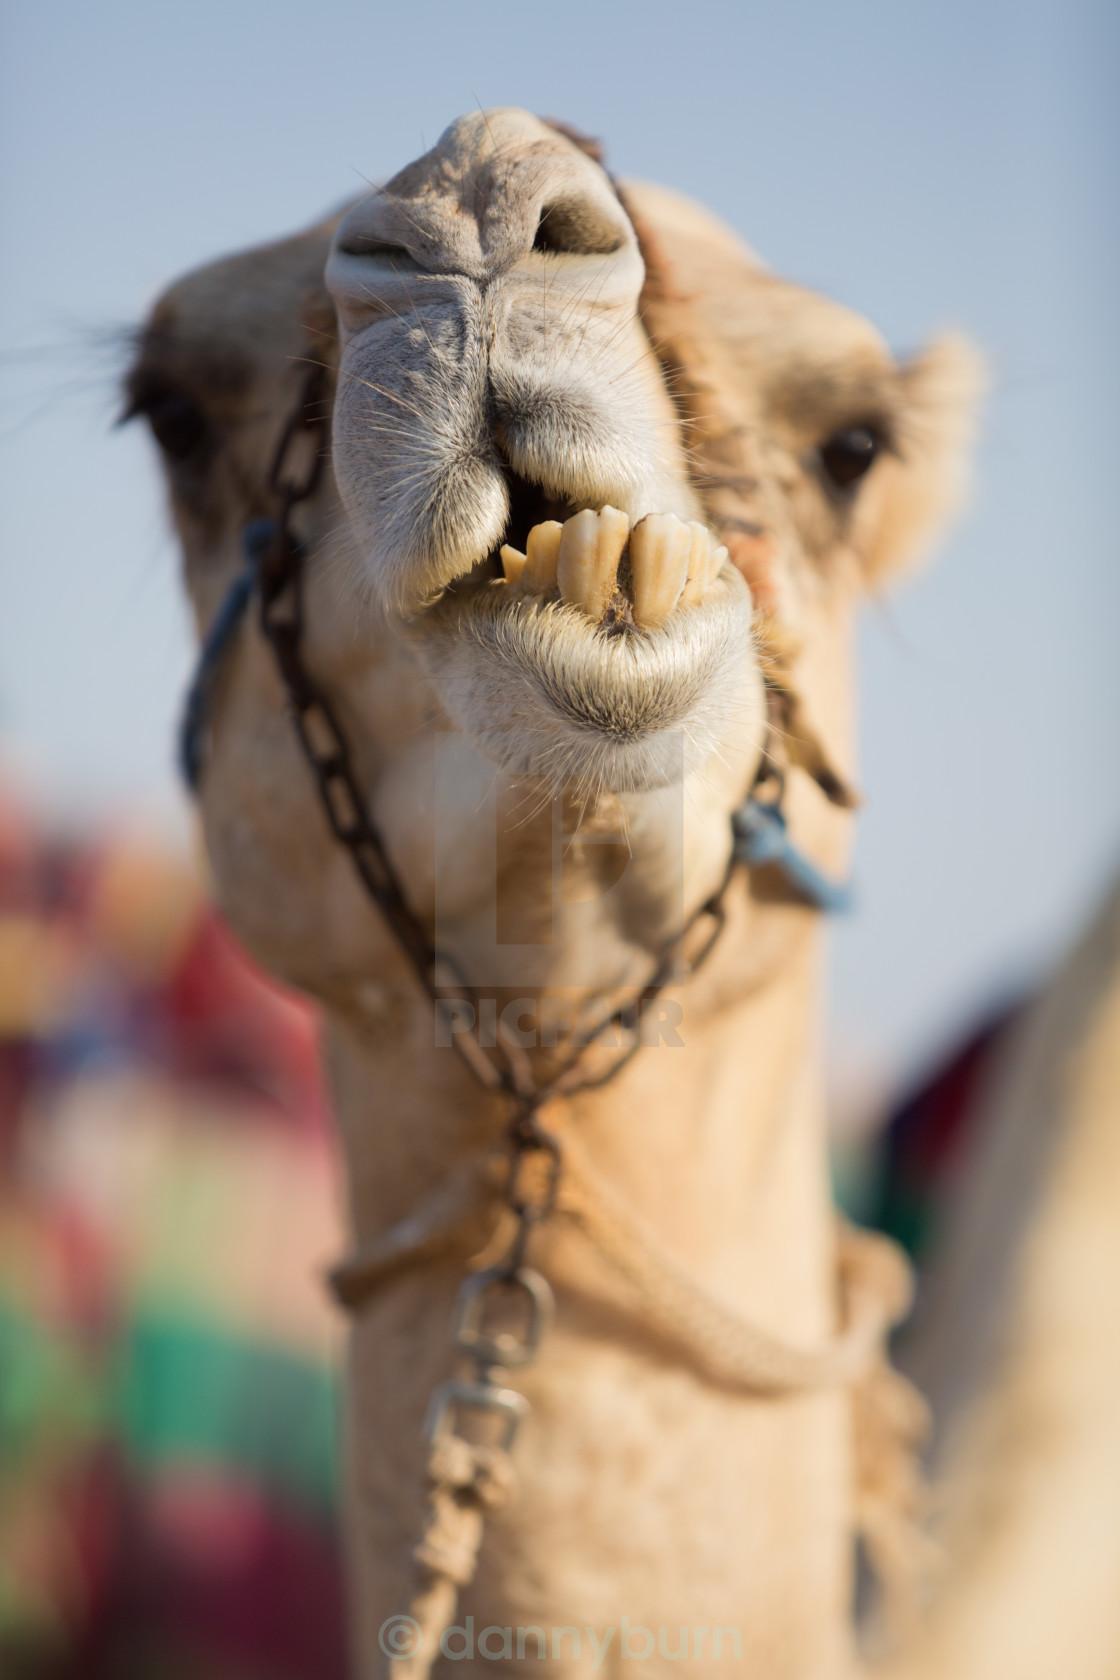 """dubai camel club camel chewing food"" stock image"